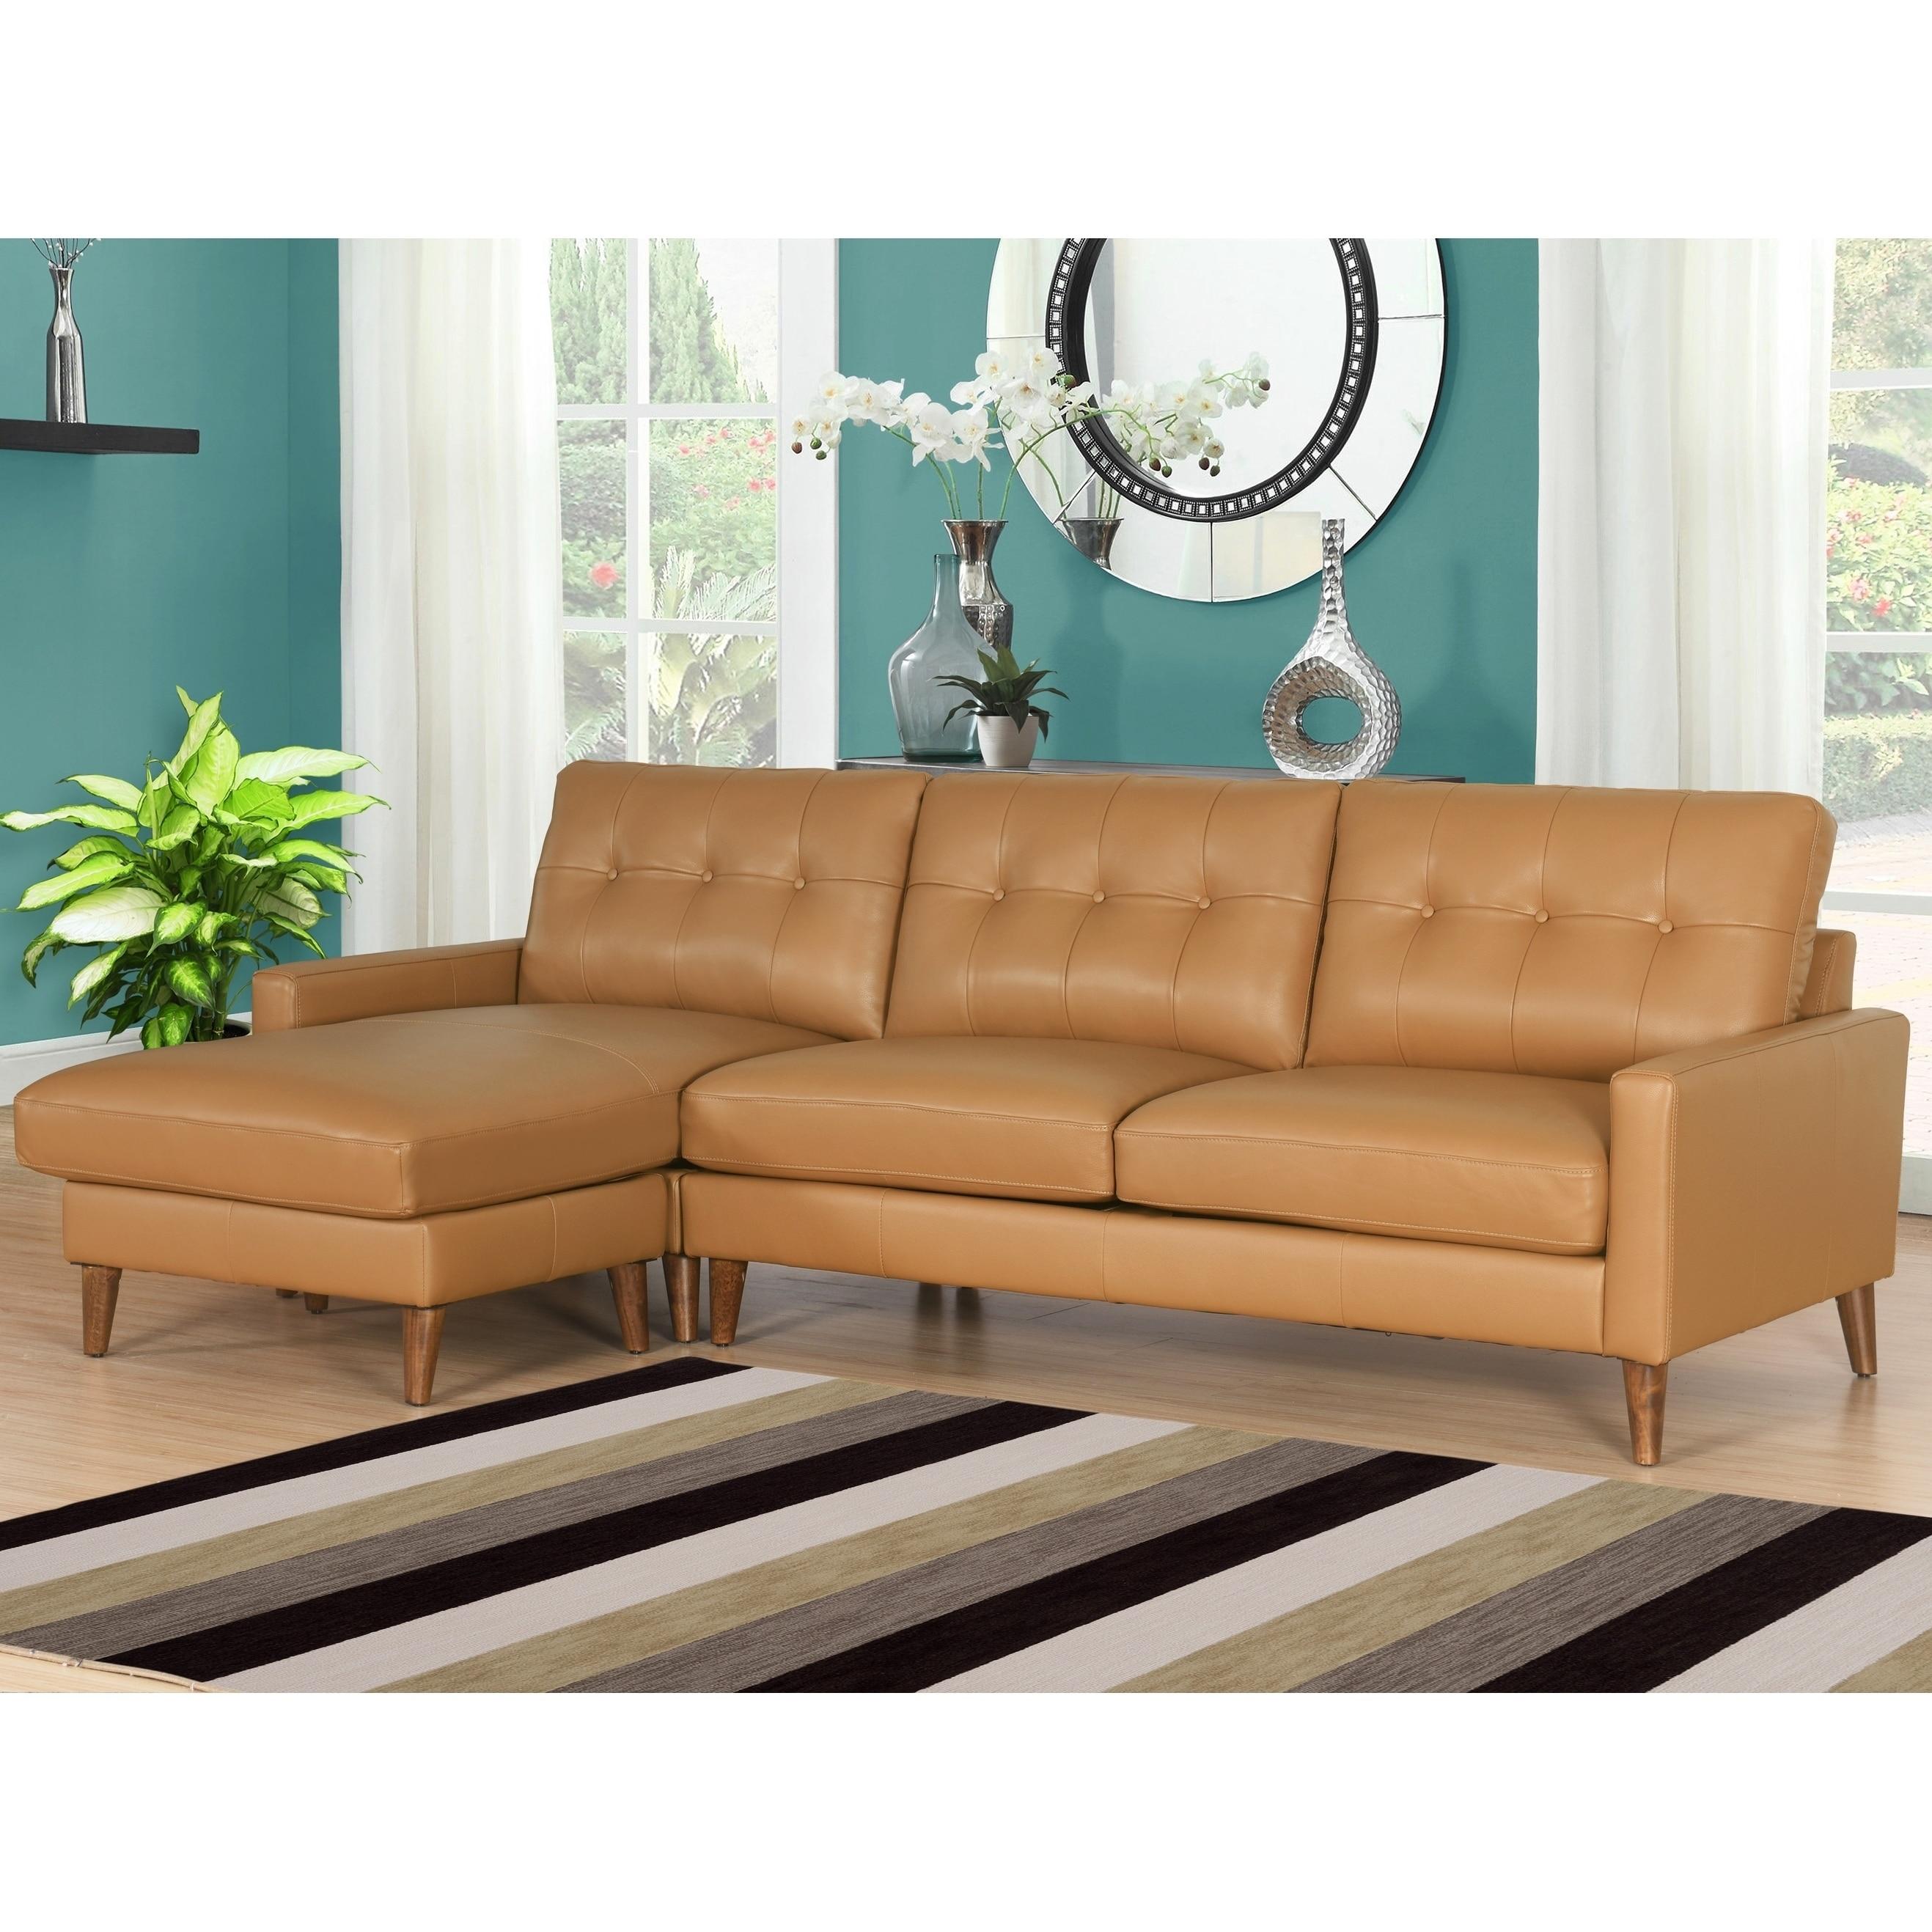 Abbyson Wright Mid Century Top Grain Leather Sectional Sofa Free  ~ Top Grain Leather Sofa Sectional